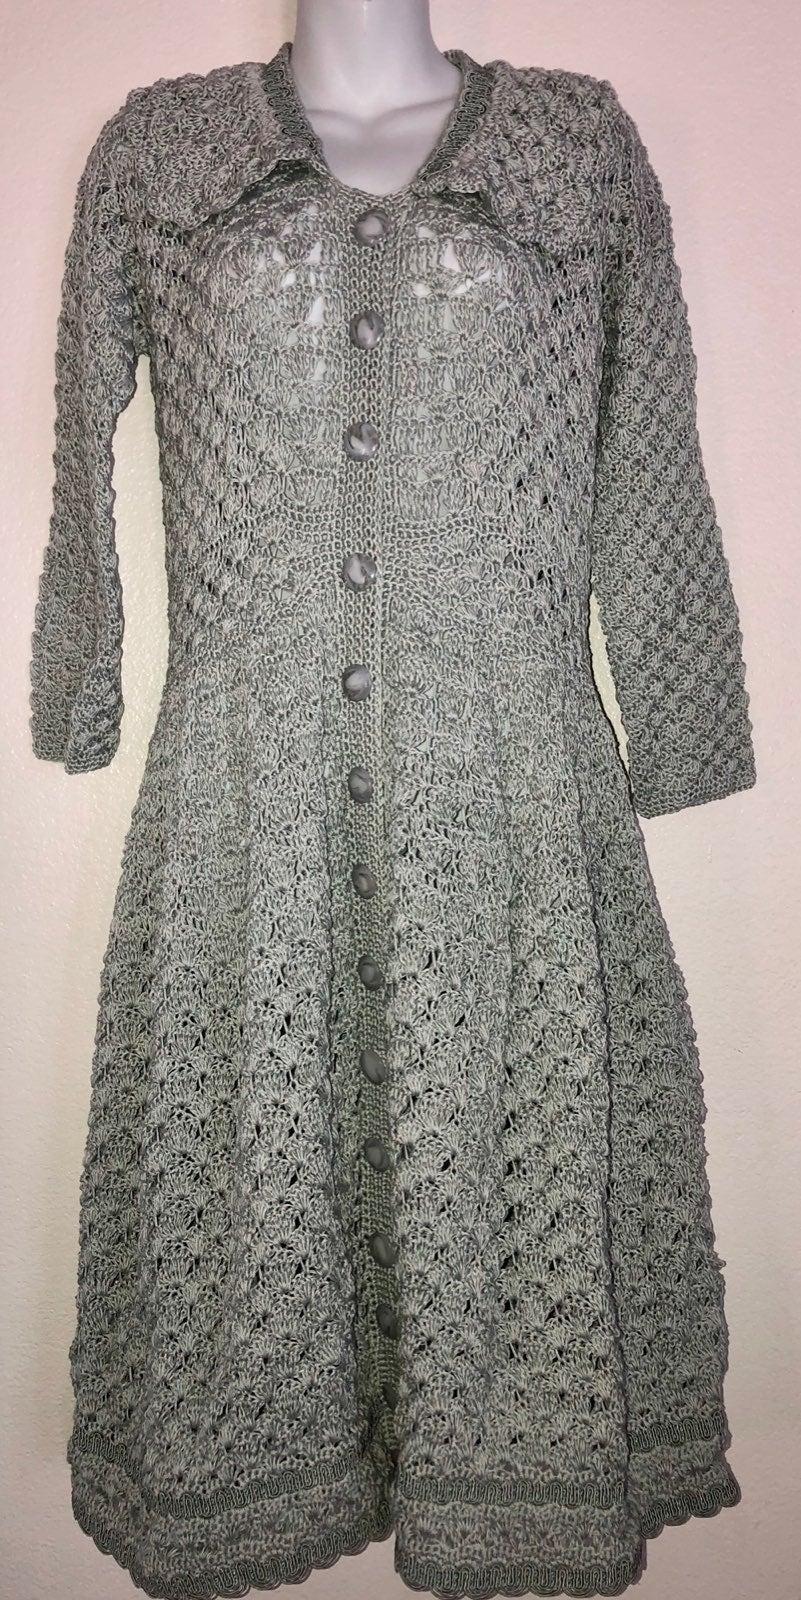 Crocheted cotton long dress/handbag